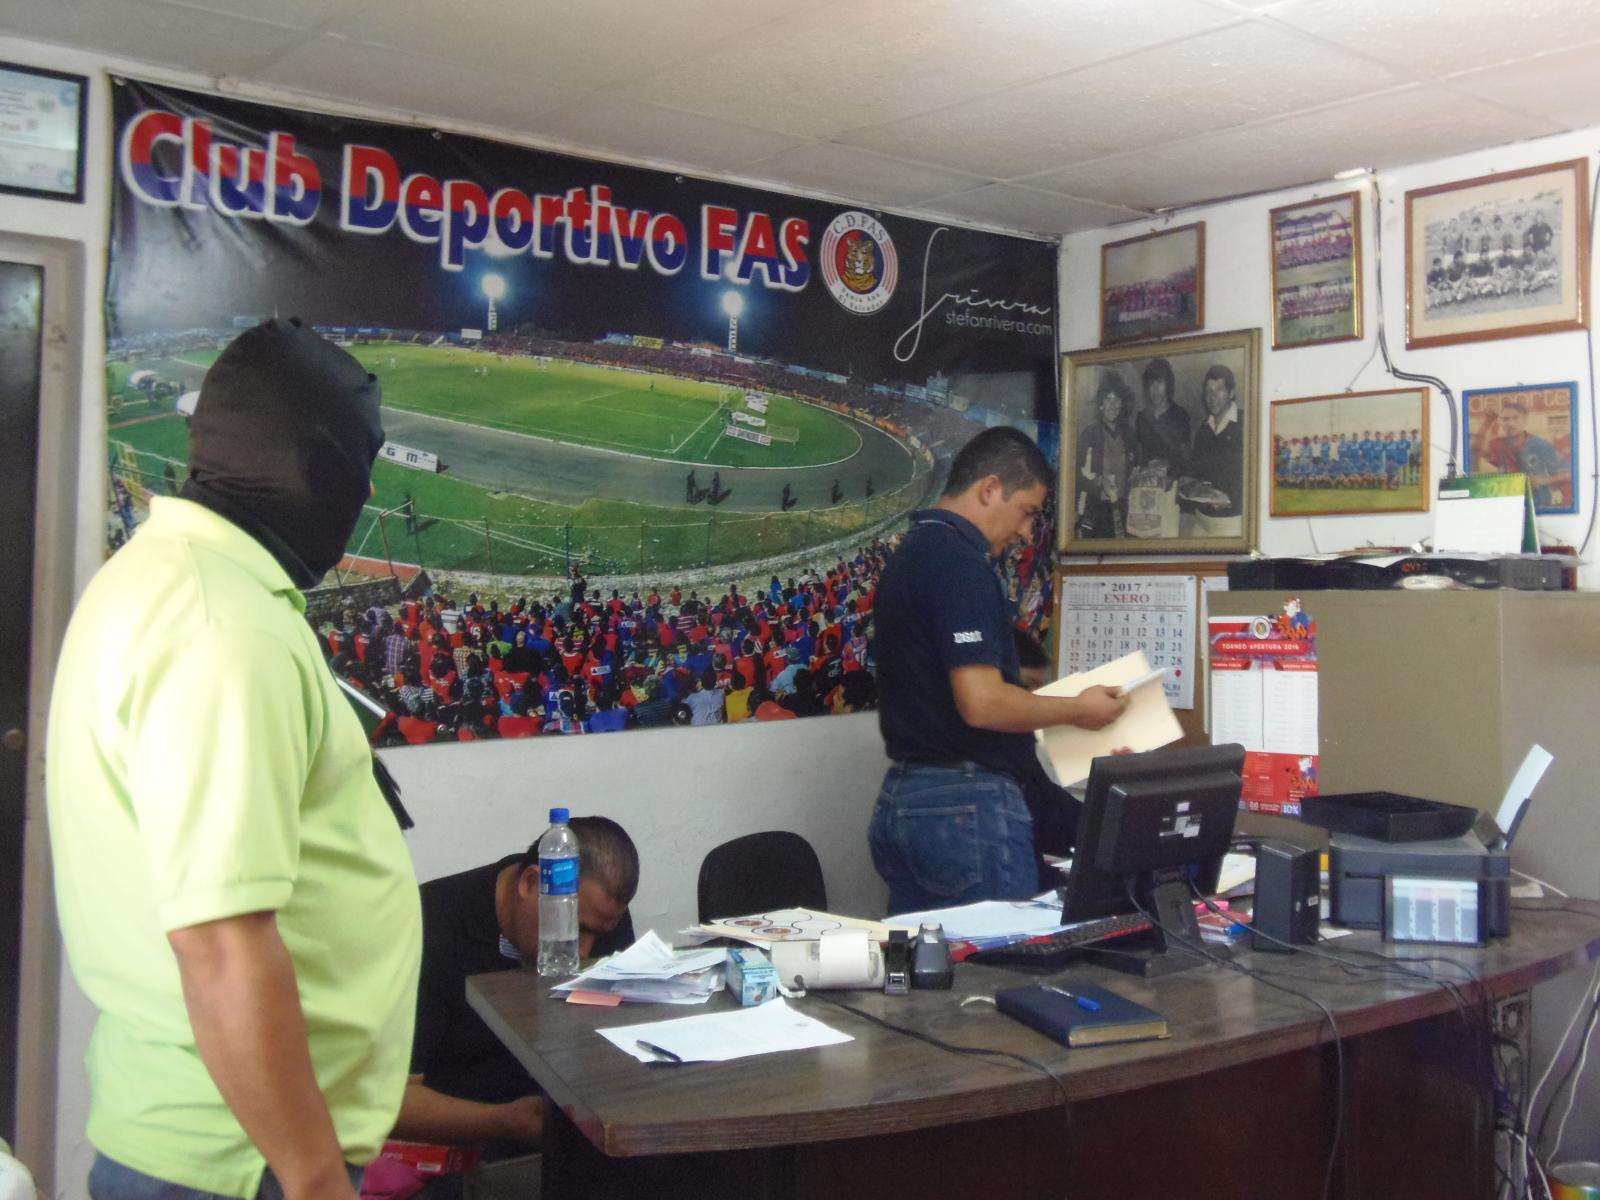 Arrestan a expresidente de Club Deportivo FAS, Rafael Villacorta